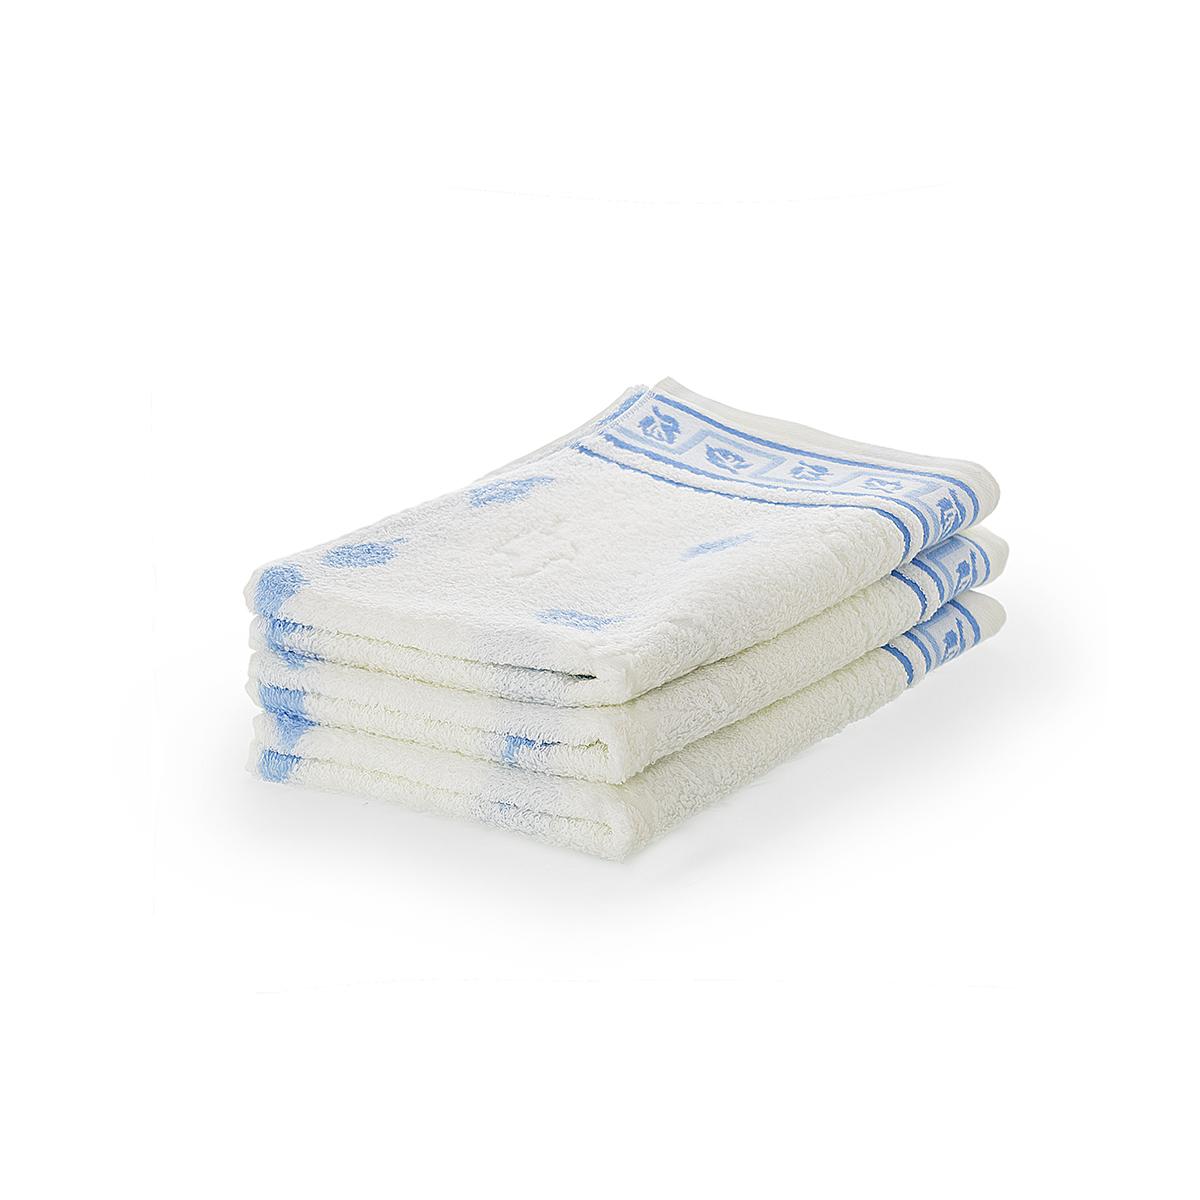 Полотенце Листопад Голубой, размер 65х135 смМахровые полотенца<br>Плотность ткани:480 г/кв. м.<br><br>Тип: Полотенце<br>Размер: 65х135<br>Материал: Махра